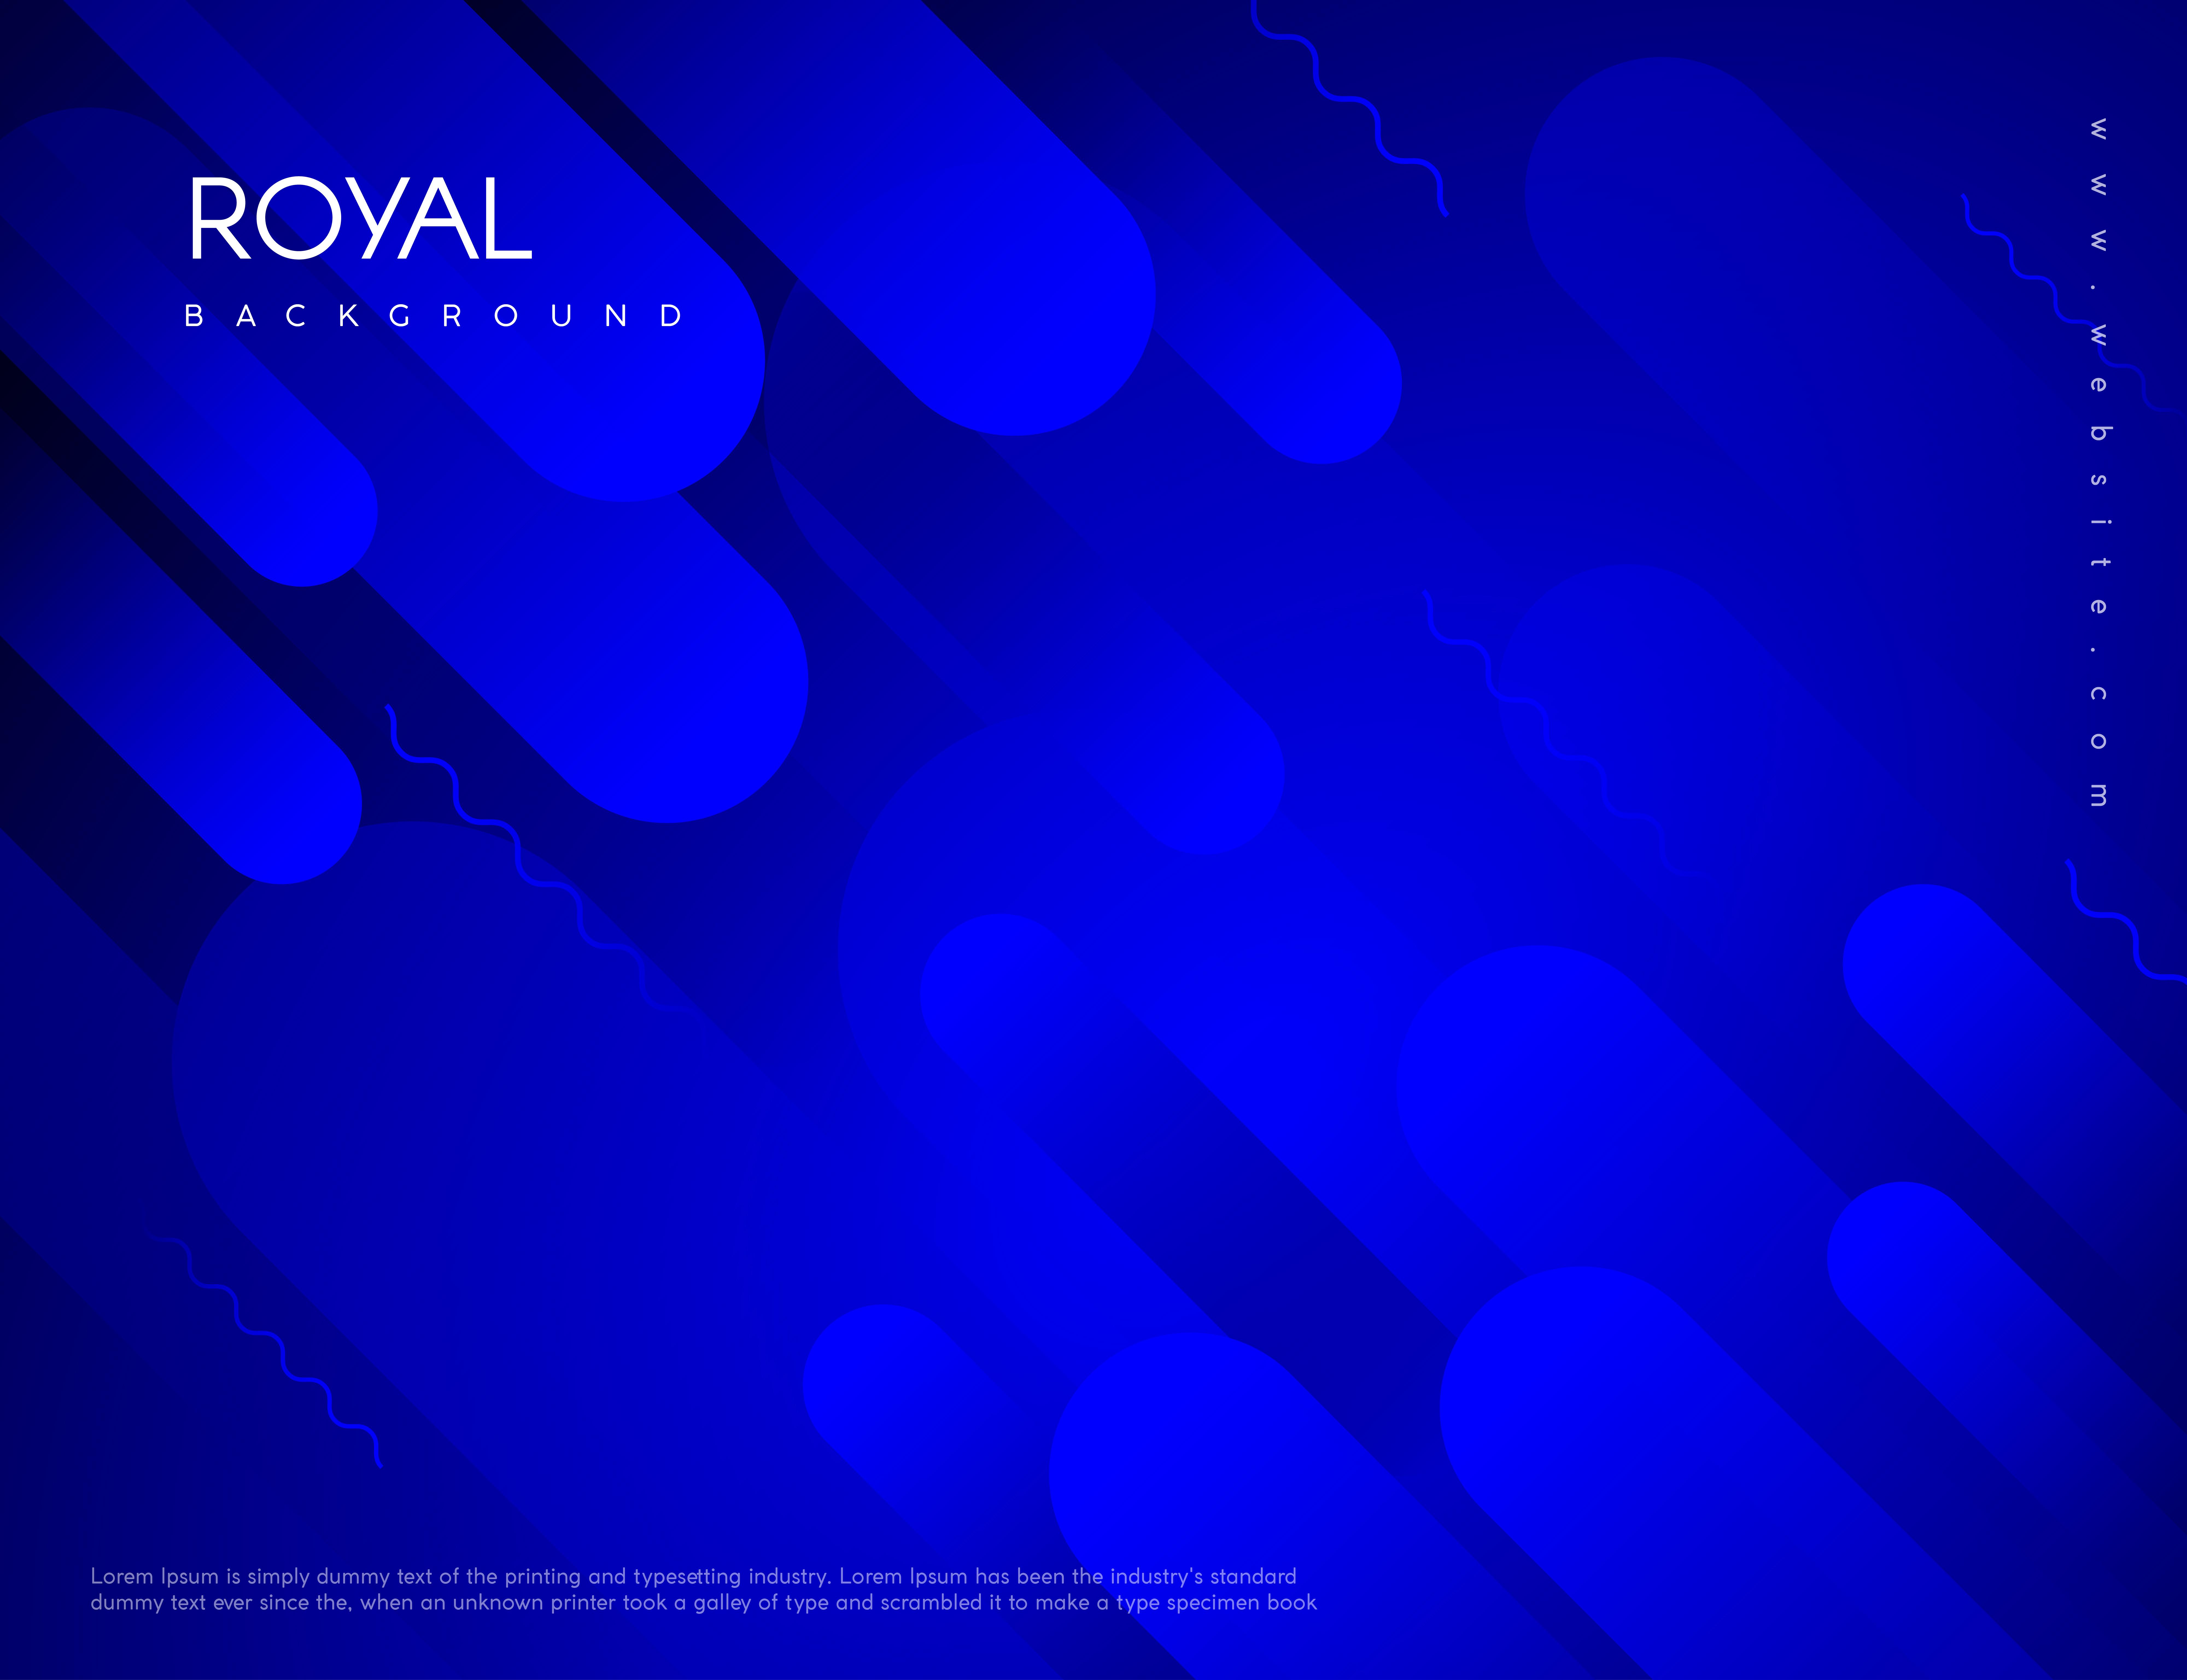 Royal Blue Background 677261 Vector Art At Vecteezy